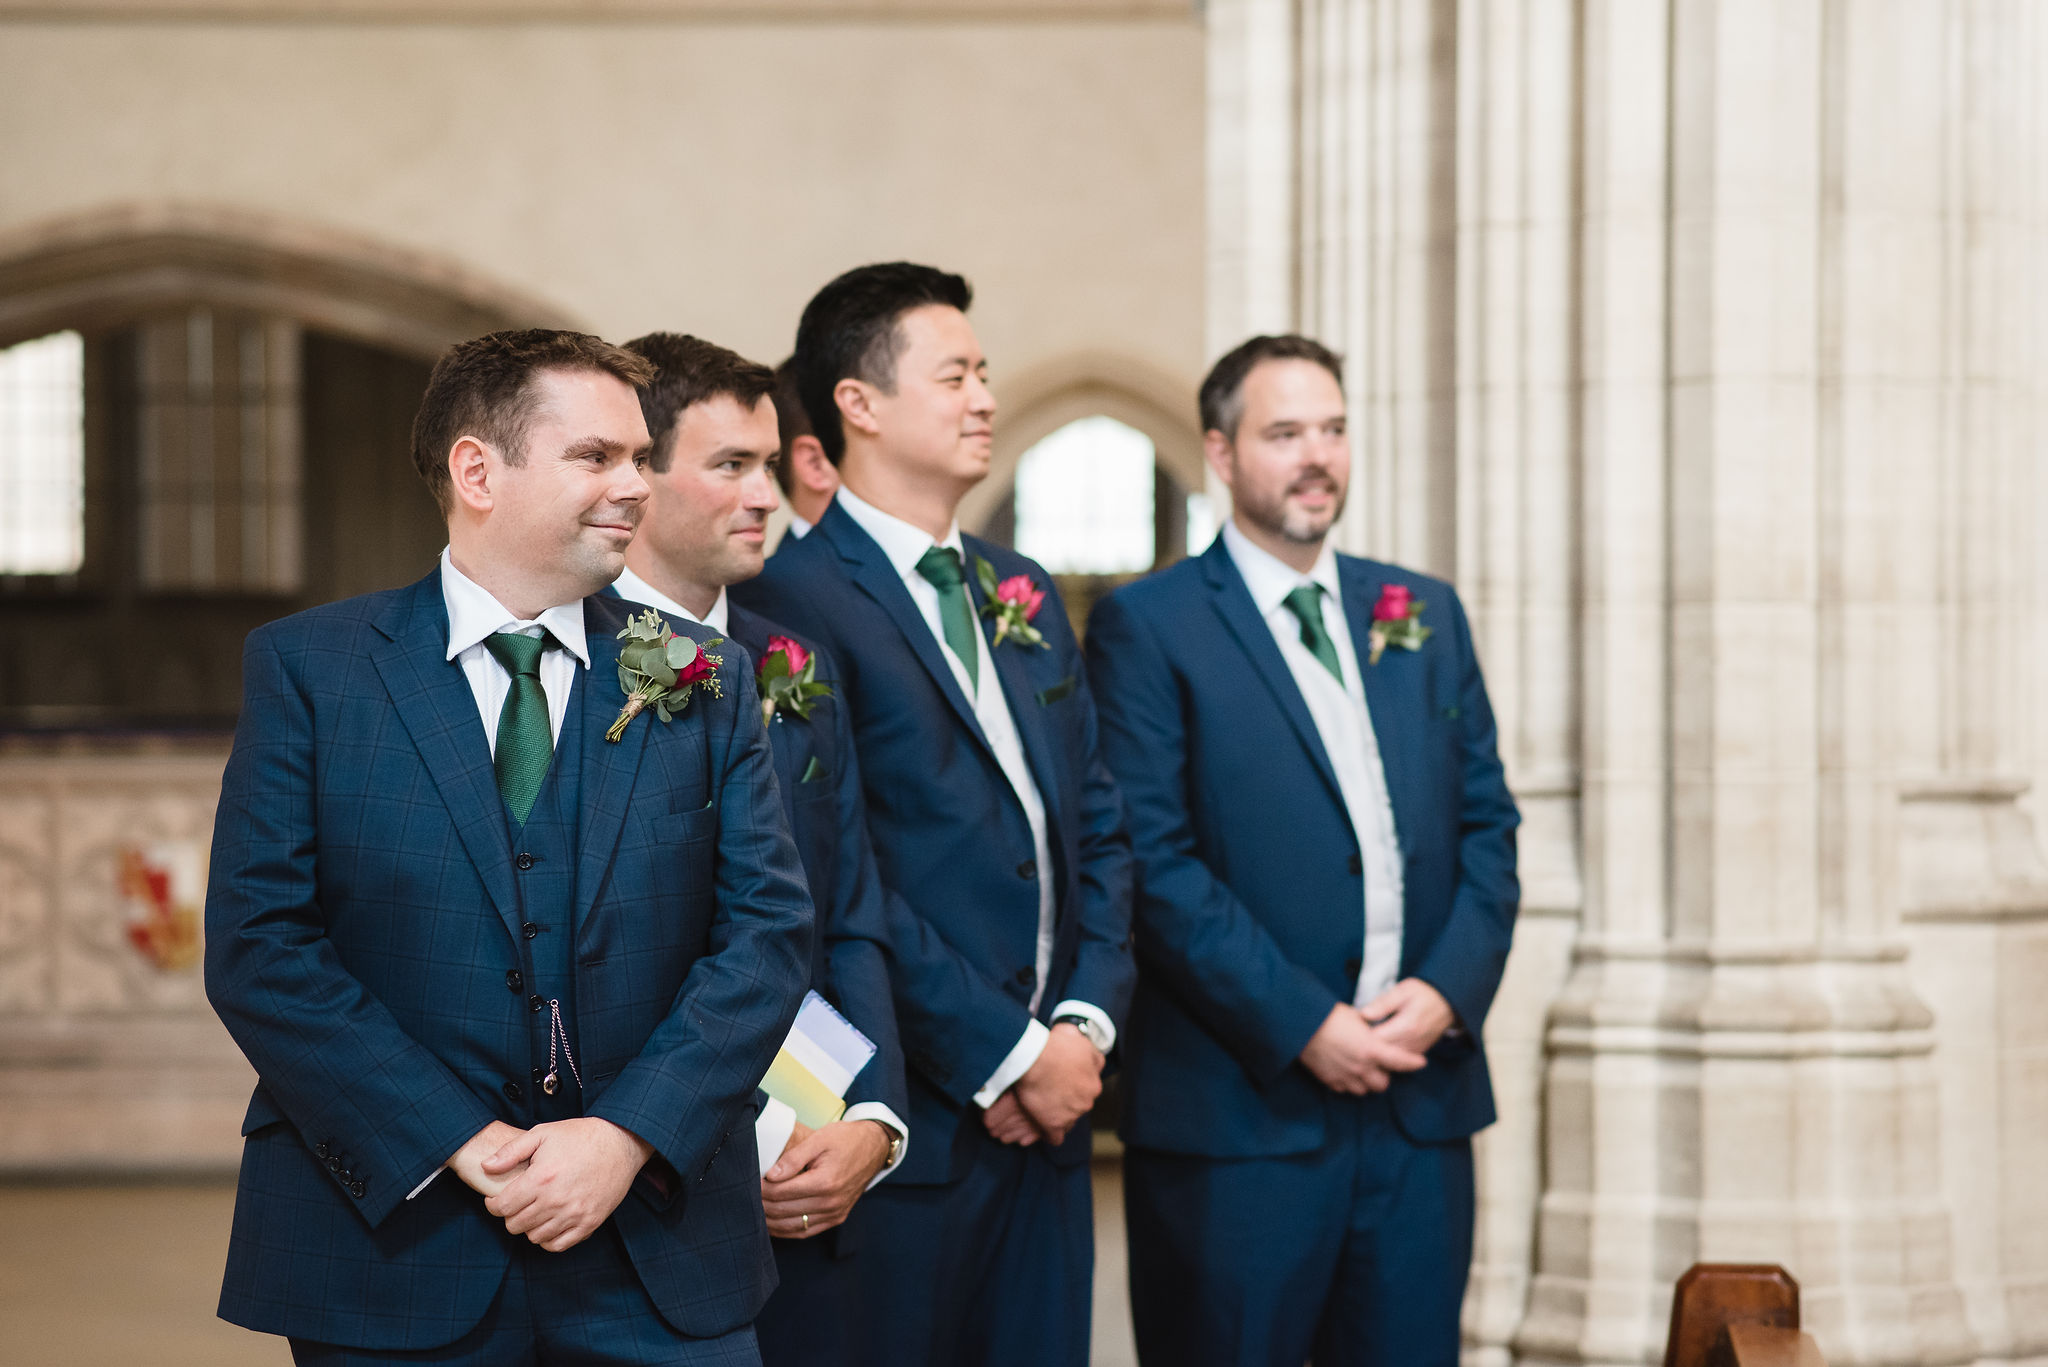 The Anthologist_Drake_and_Morgan_London_Wedding_36.jpg